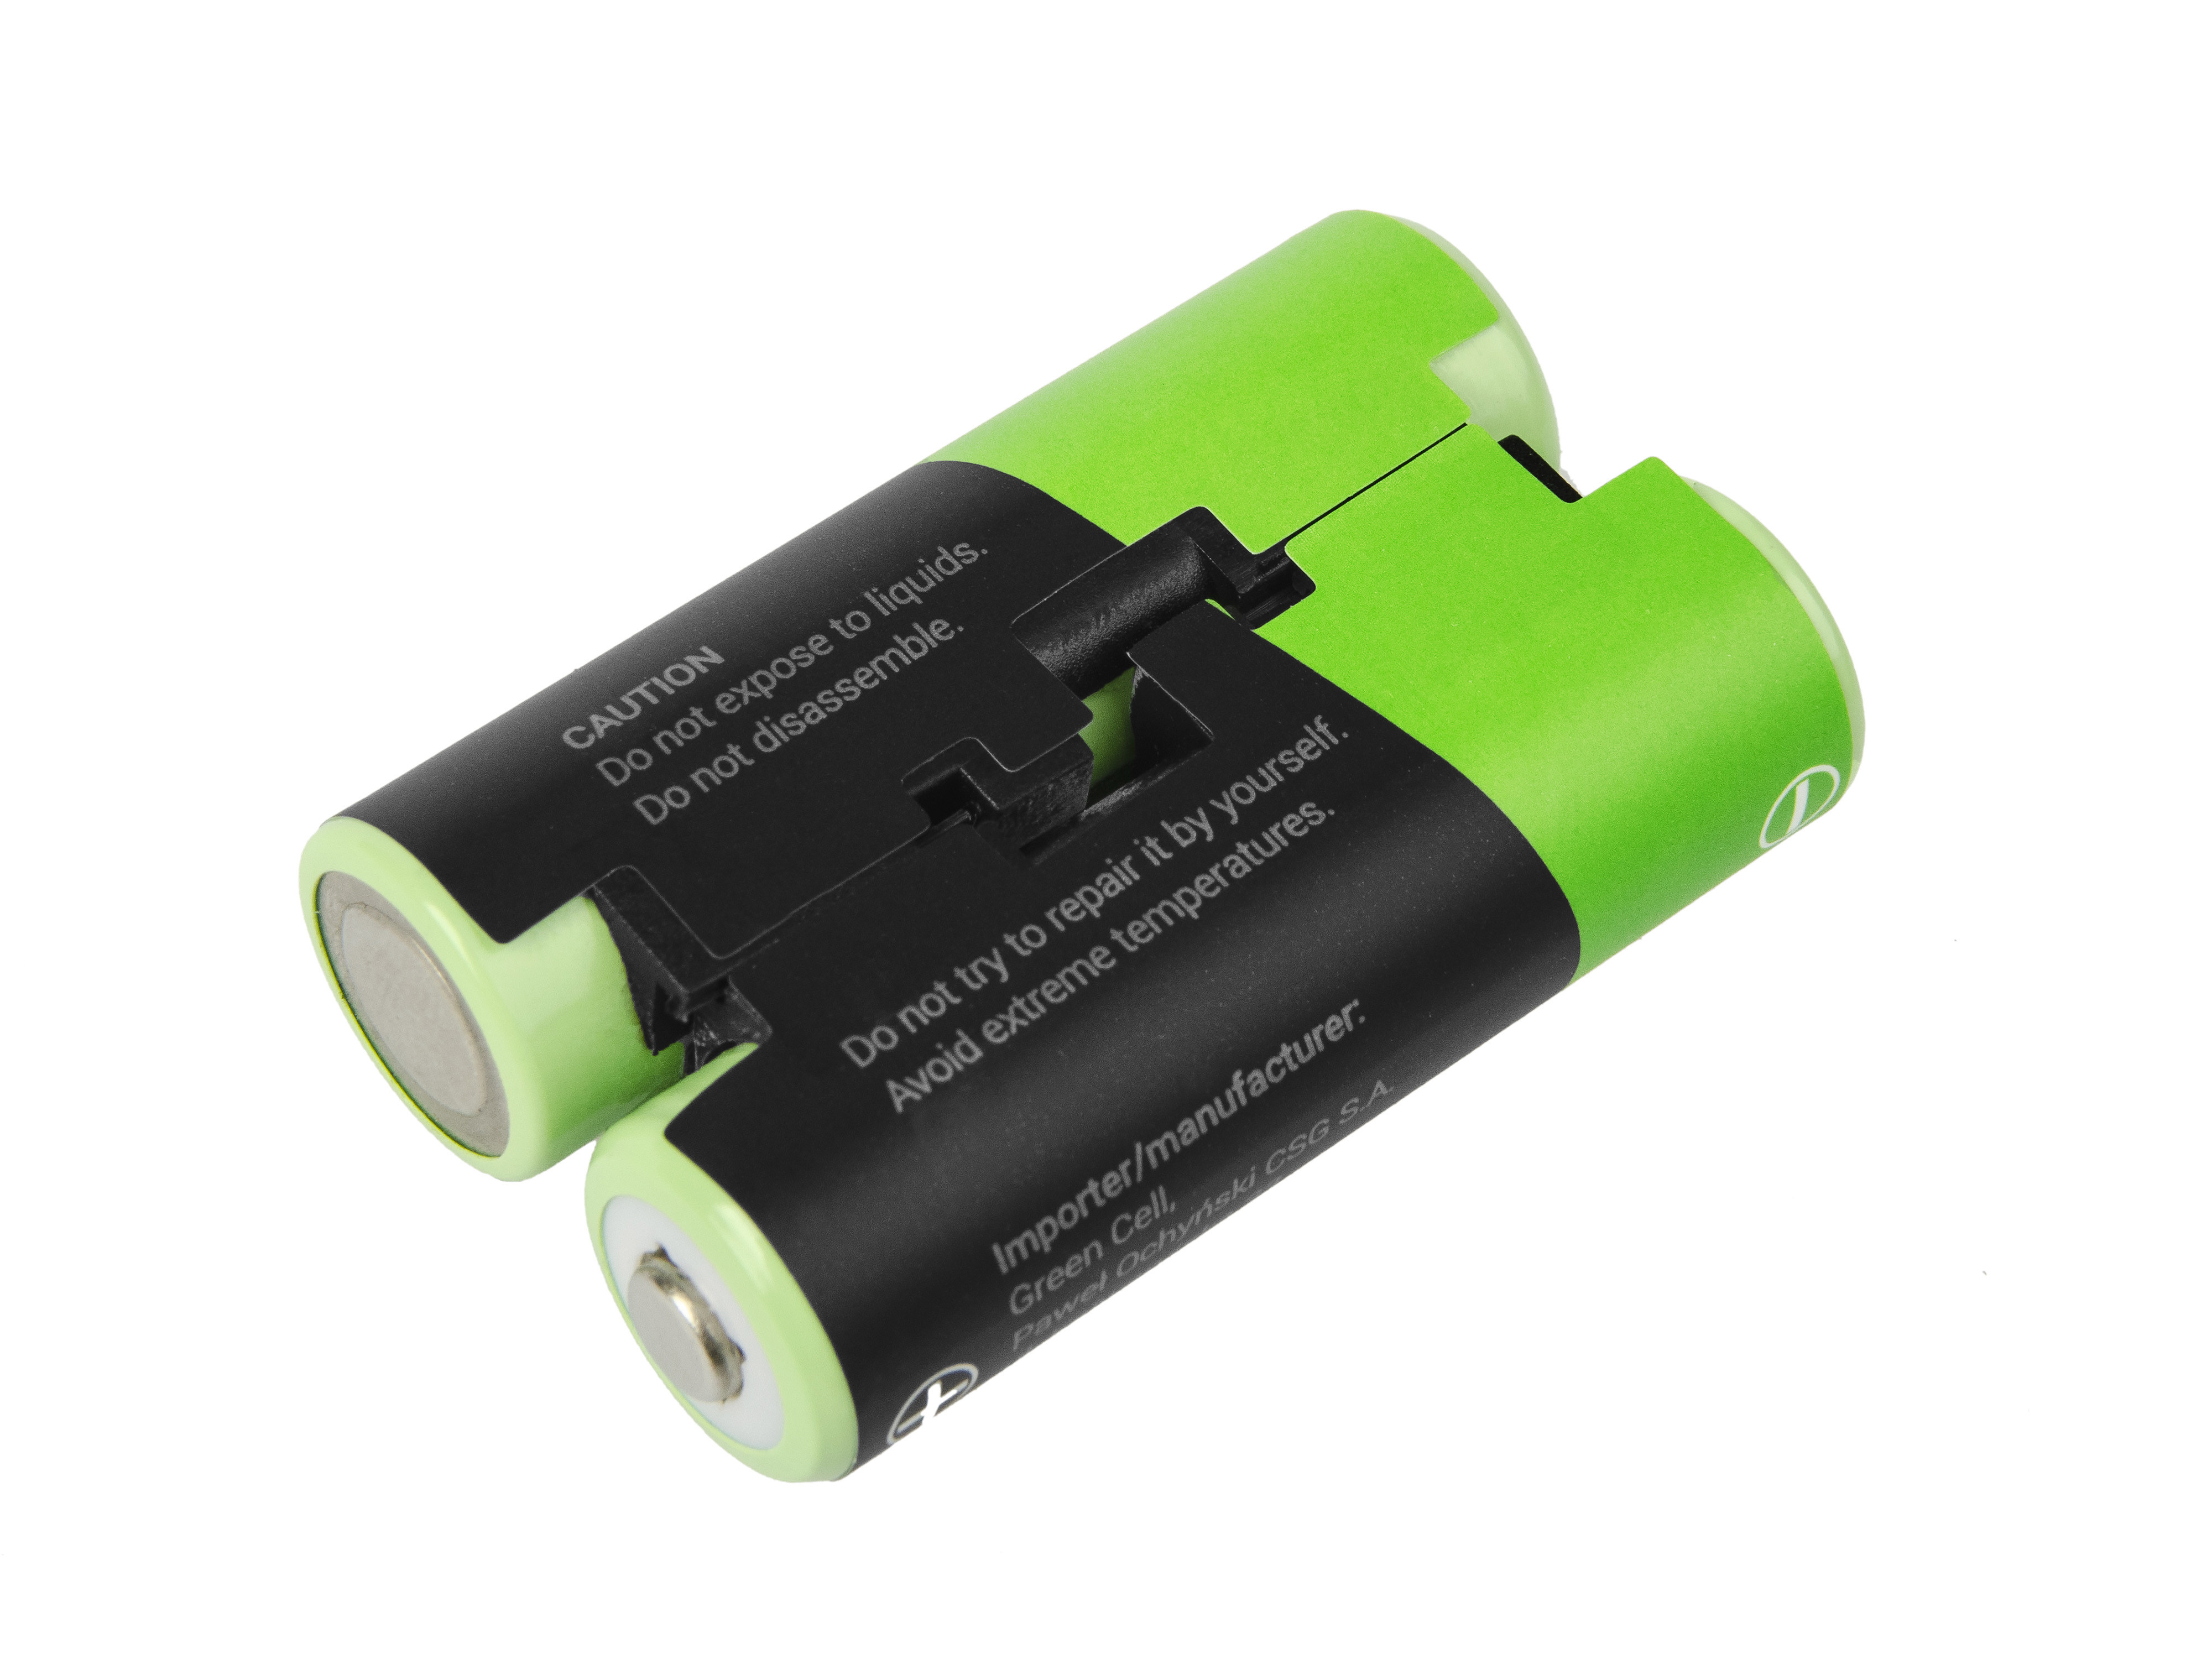 Green Cell GPS Baterie 010-11874-00 Garmin Astro 430 Oregon 600 700 750T GPSMAP 64 64s Striker 4